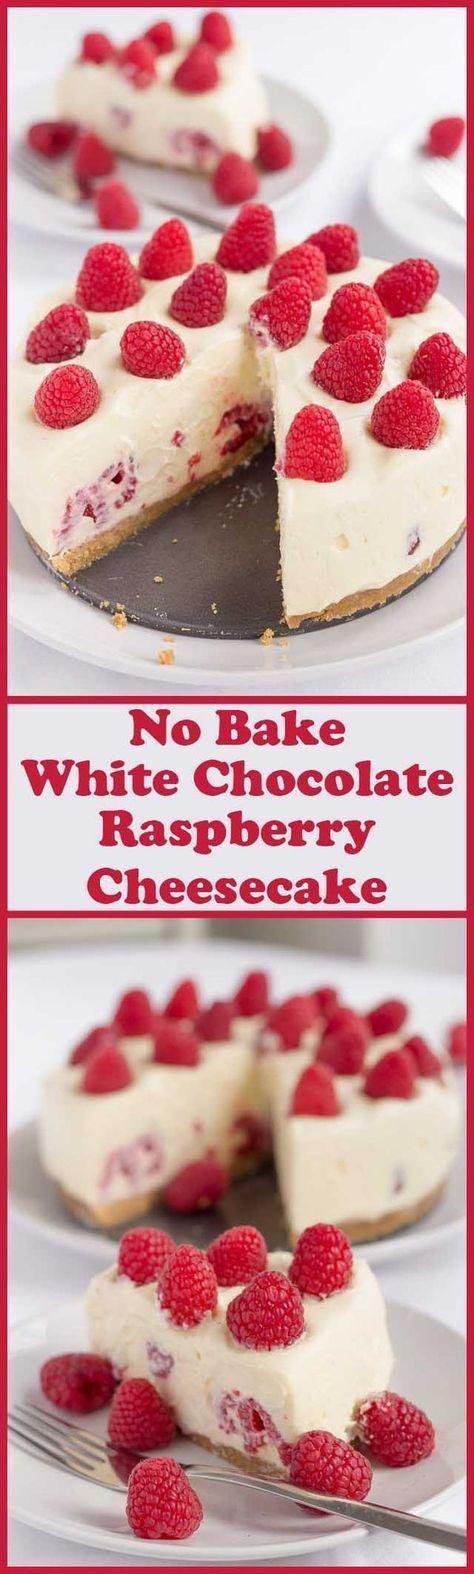 White Chocolate and Raspberry Cheesecake – Easy To Make Dessert #whitechocolateraspberrycheesecake